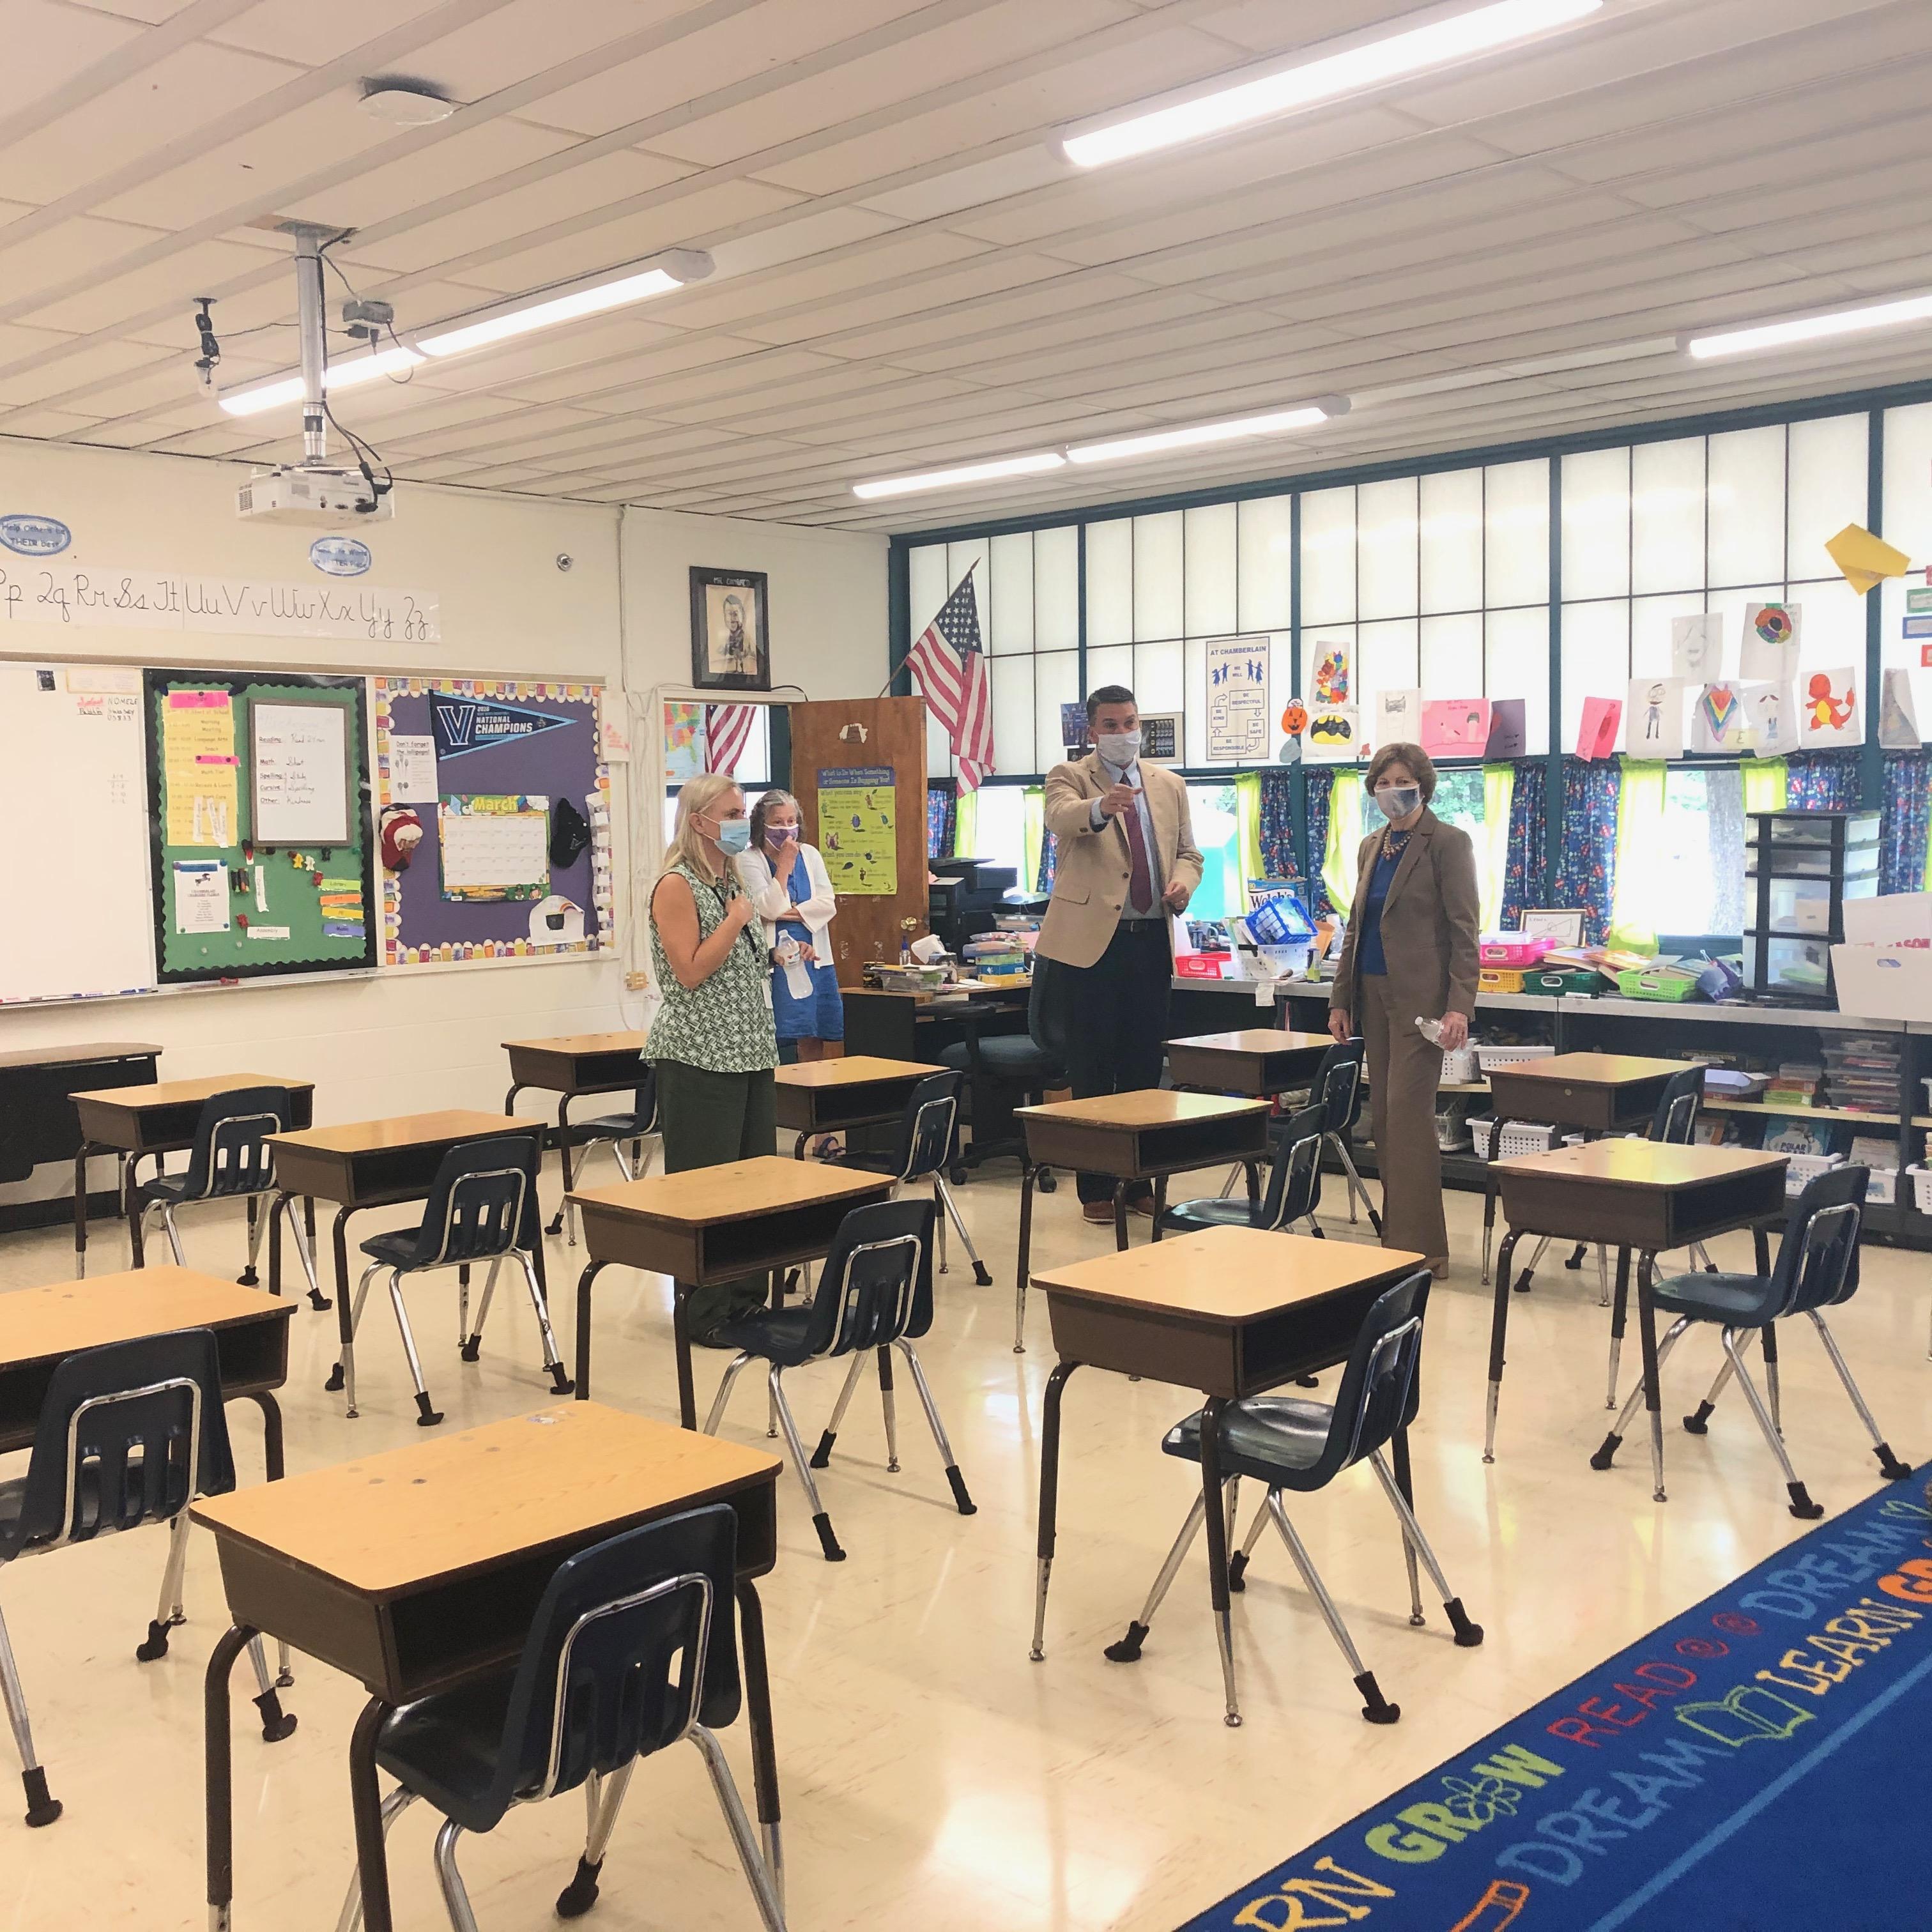 7.15.20 rochester school visit 1